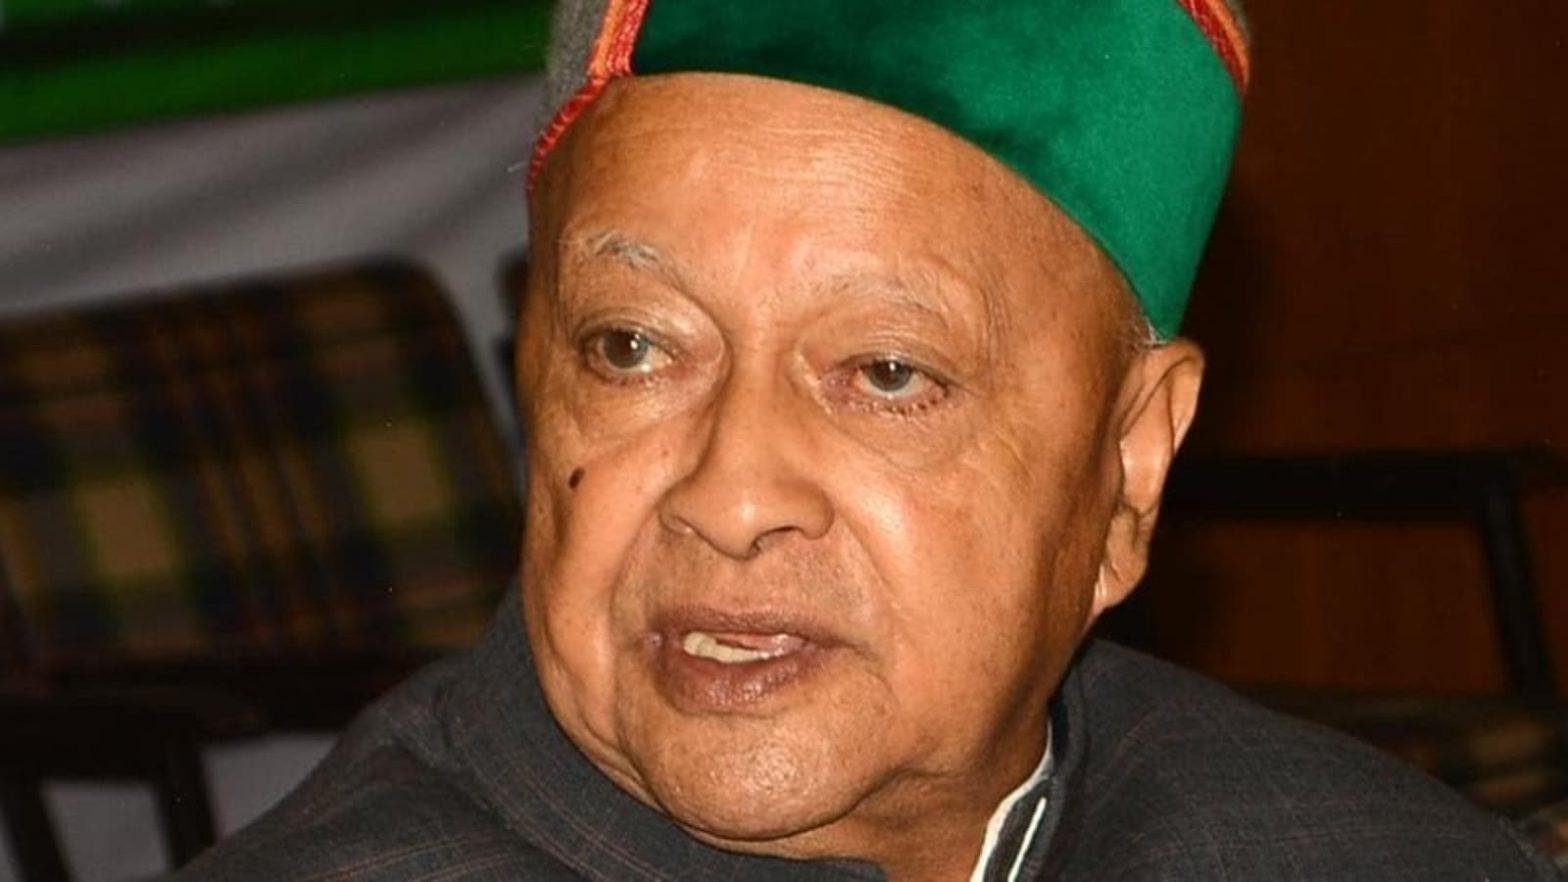 Former Himachal Pradesh Chief Minister Virbhadra Singh passes away | হিমাচল প্রদেশের প্রাক্তন মুখ্যমন্ত্রী বীরভদ্র সিং প্রয়াত হলেন_40.1